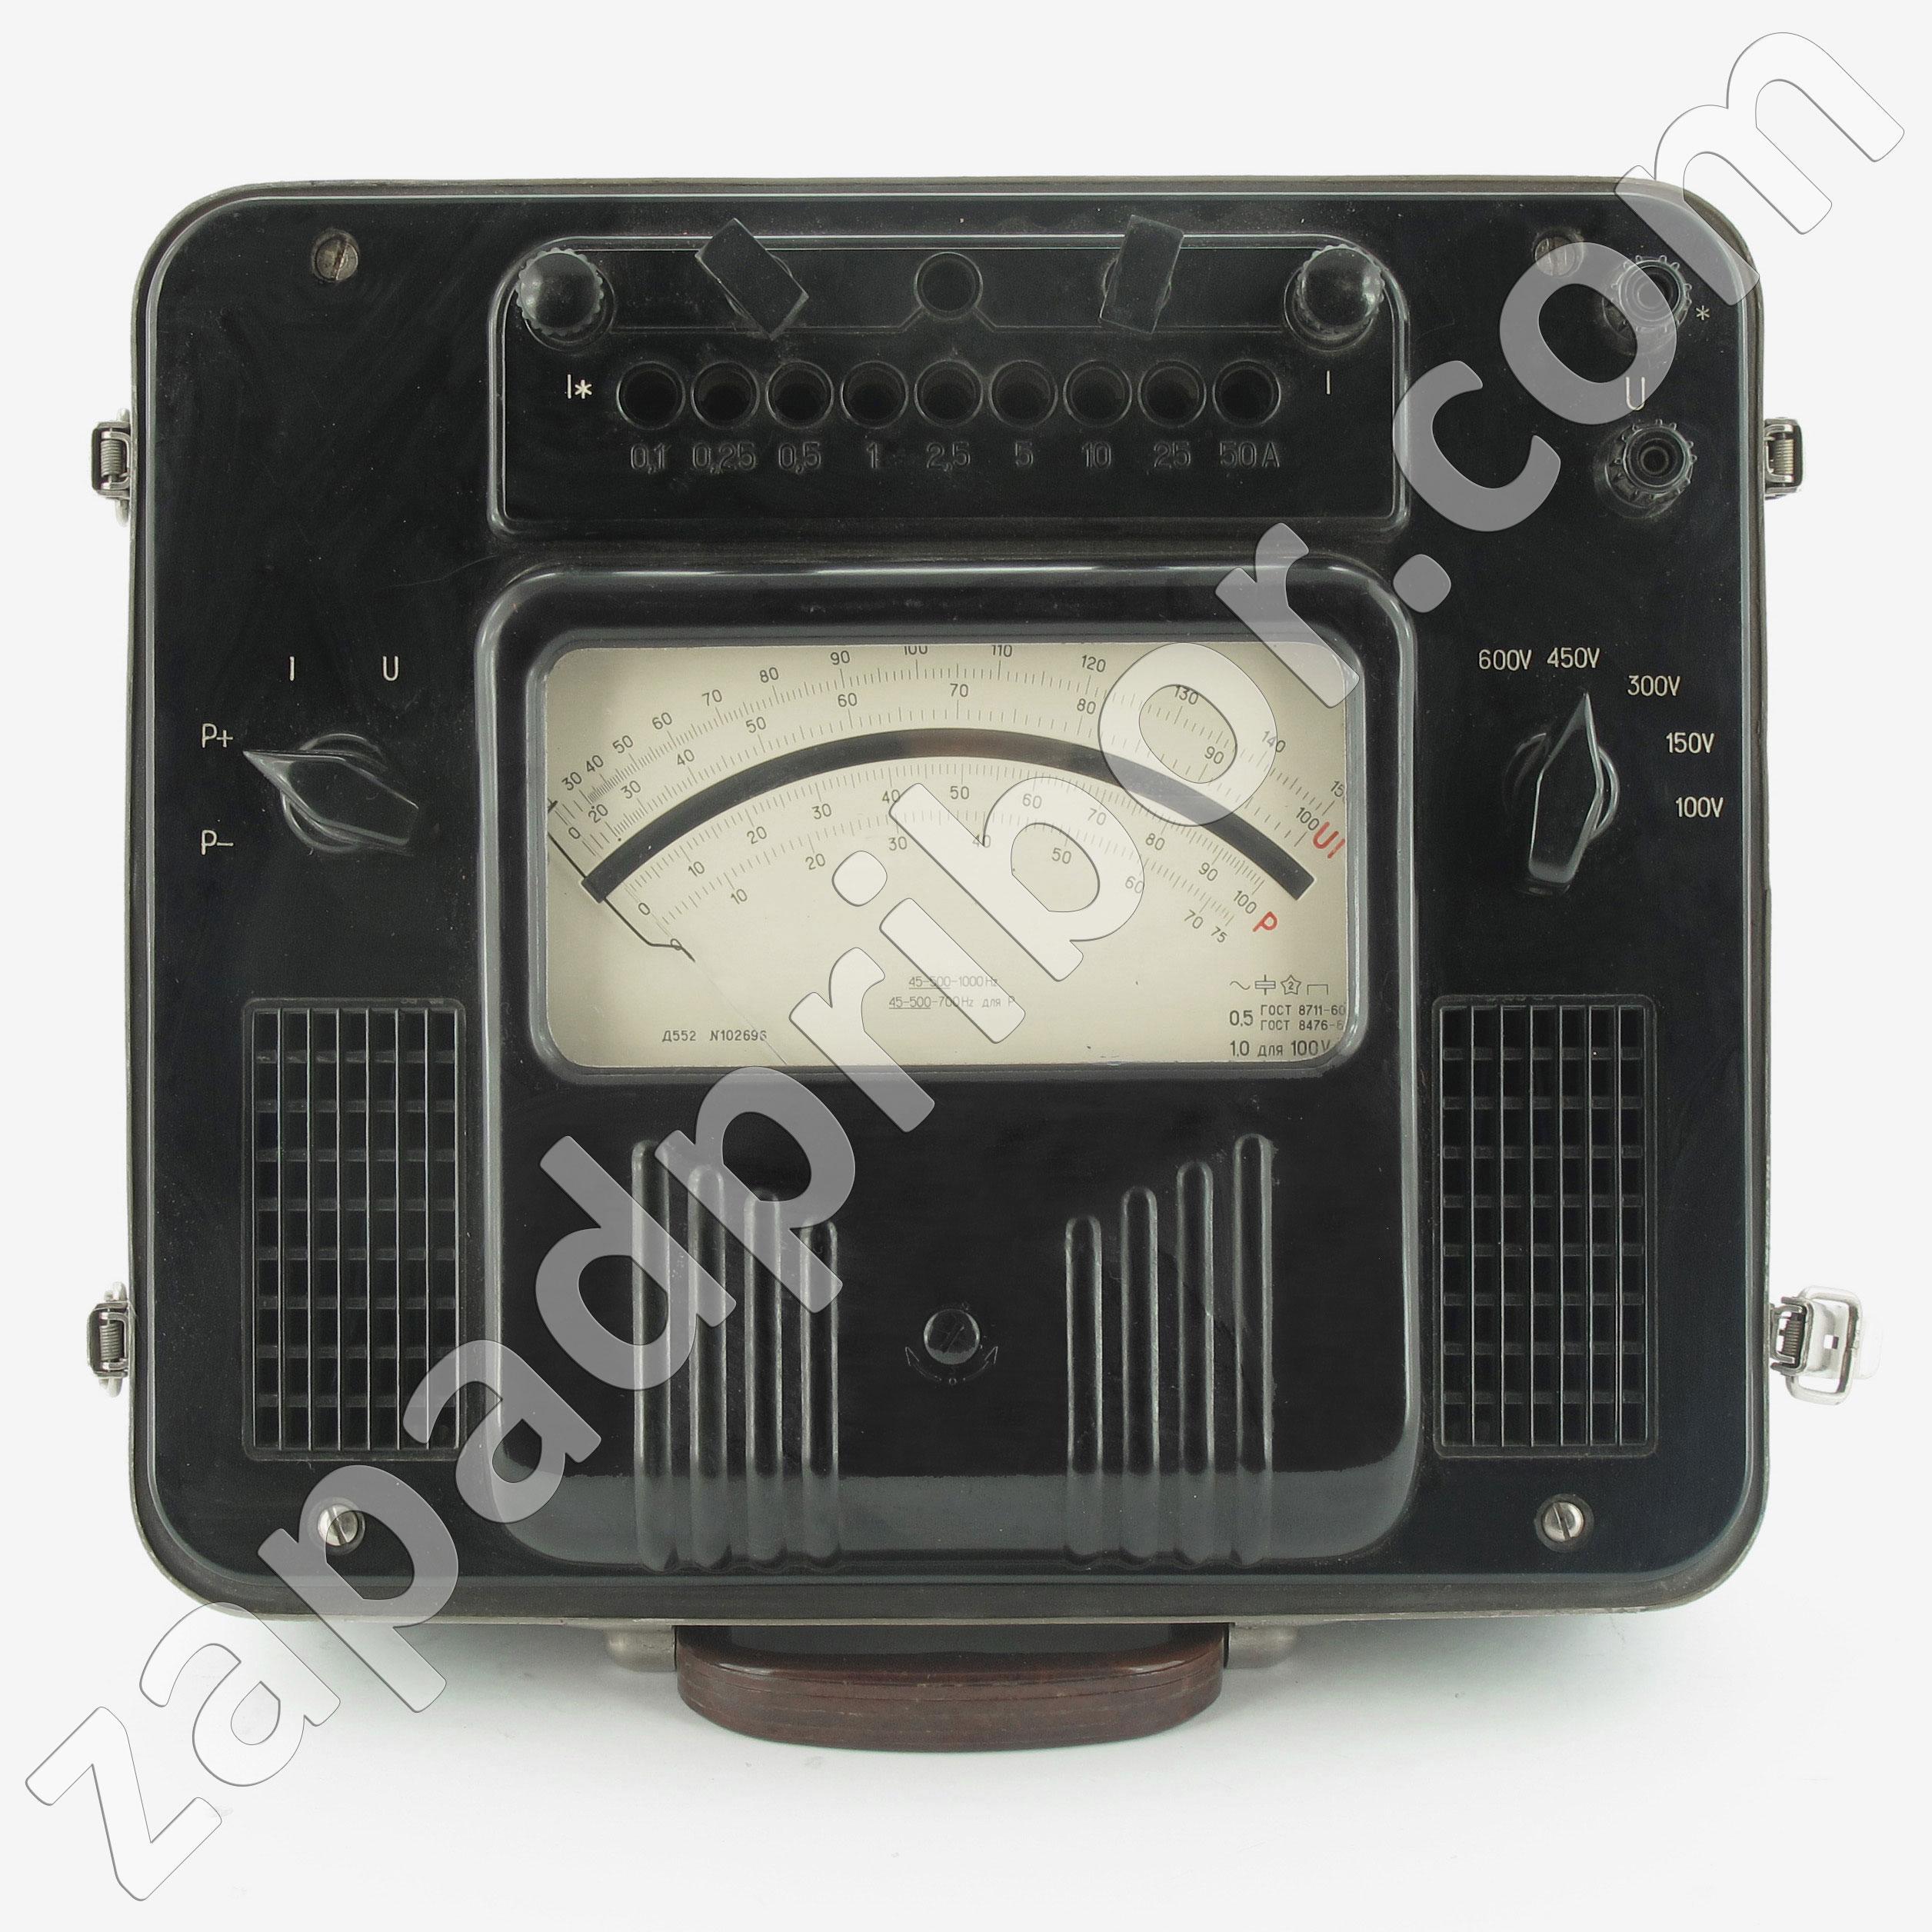 схема универсального фотометра фм-58